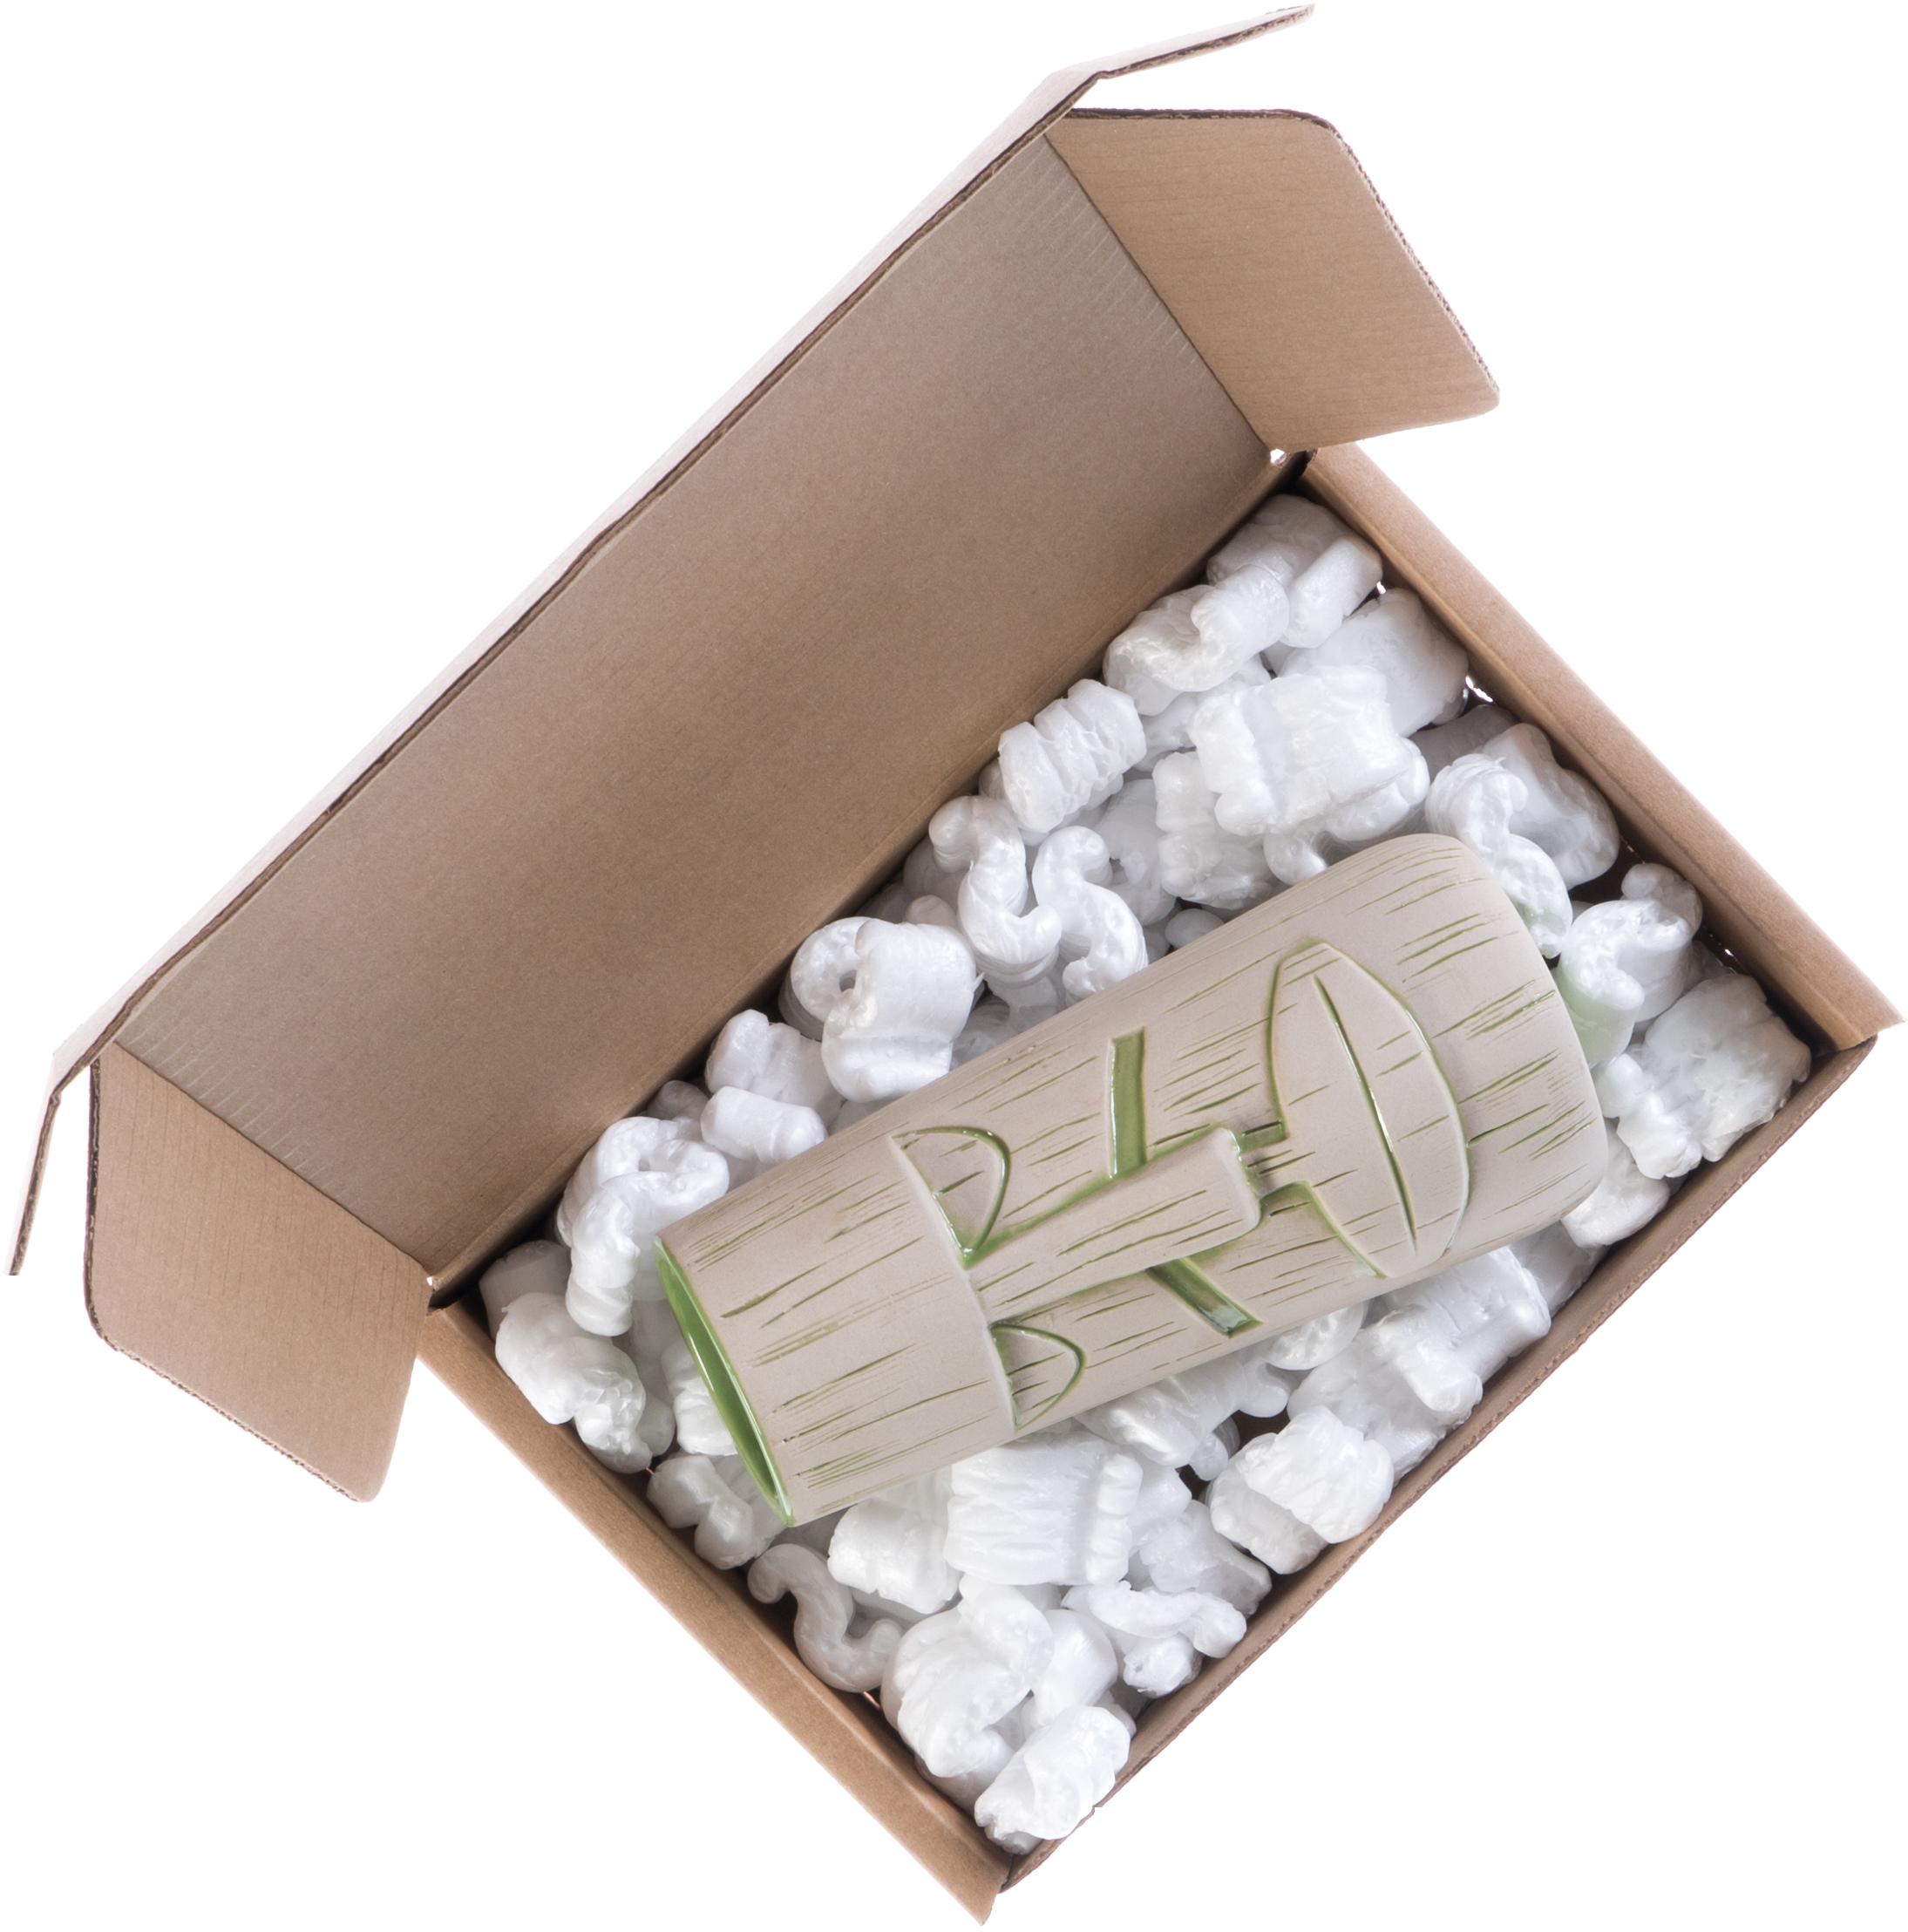 Shipping a tiki mug